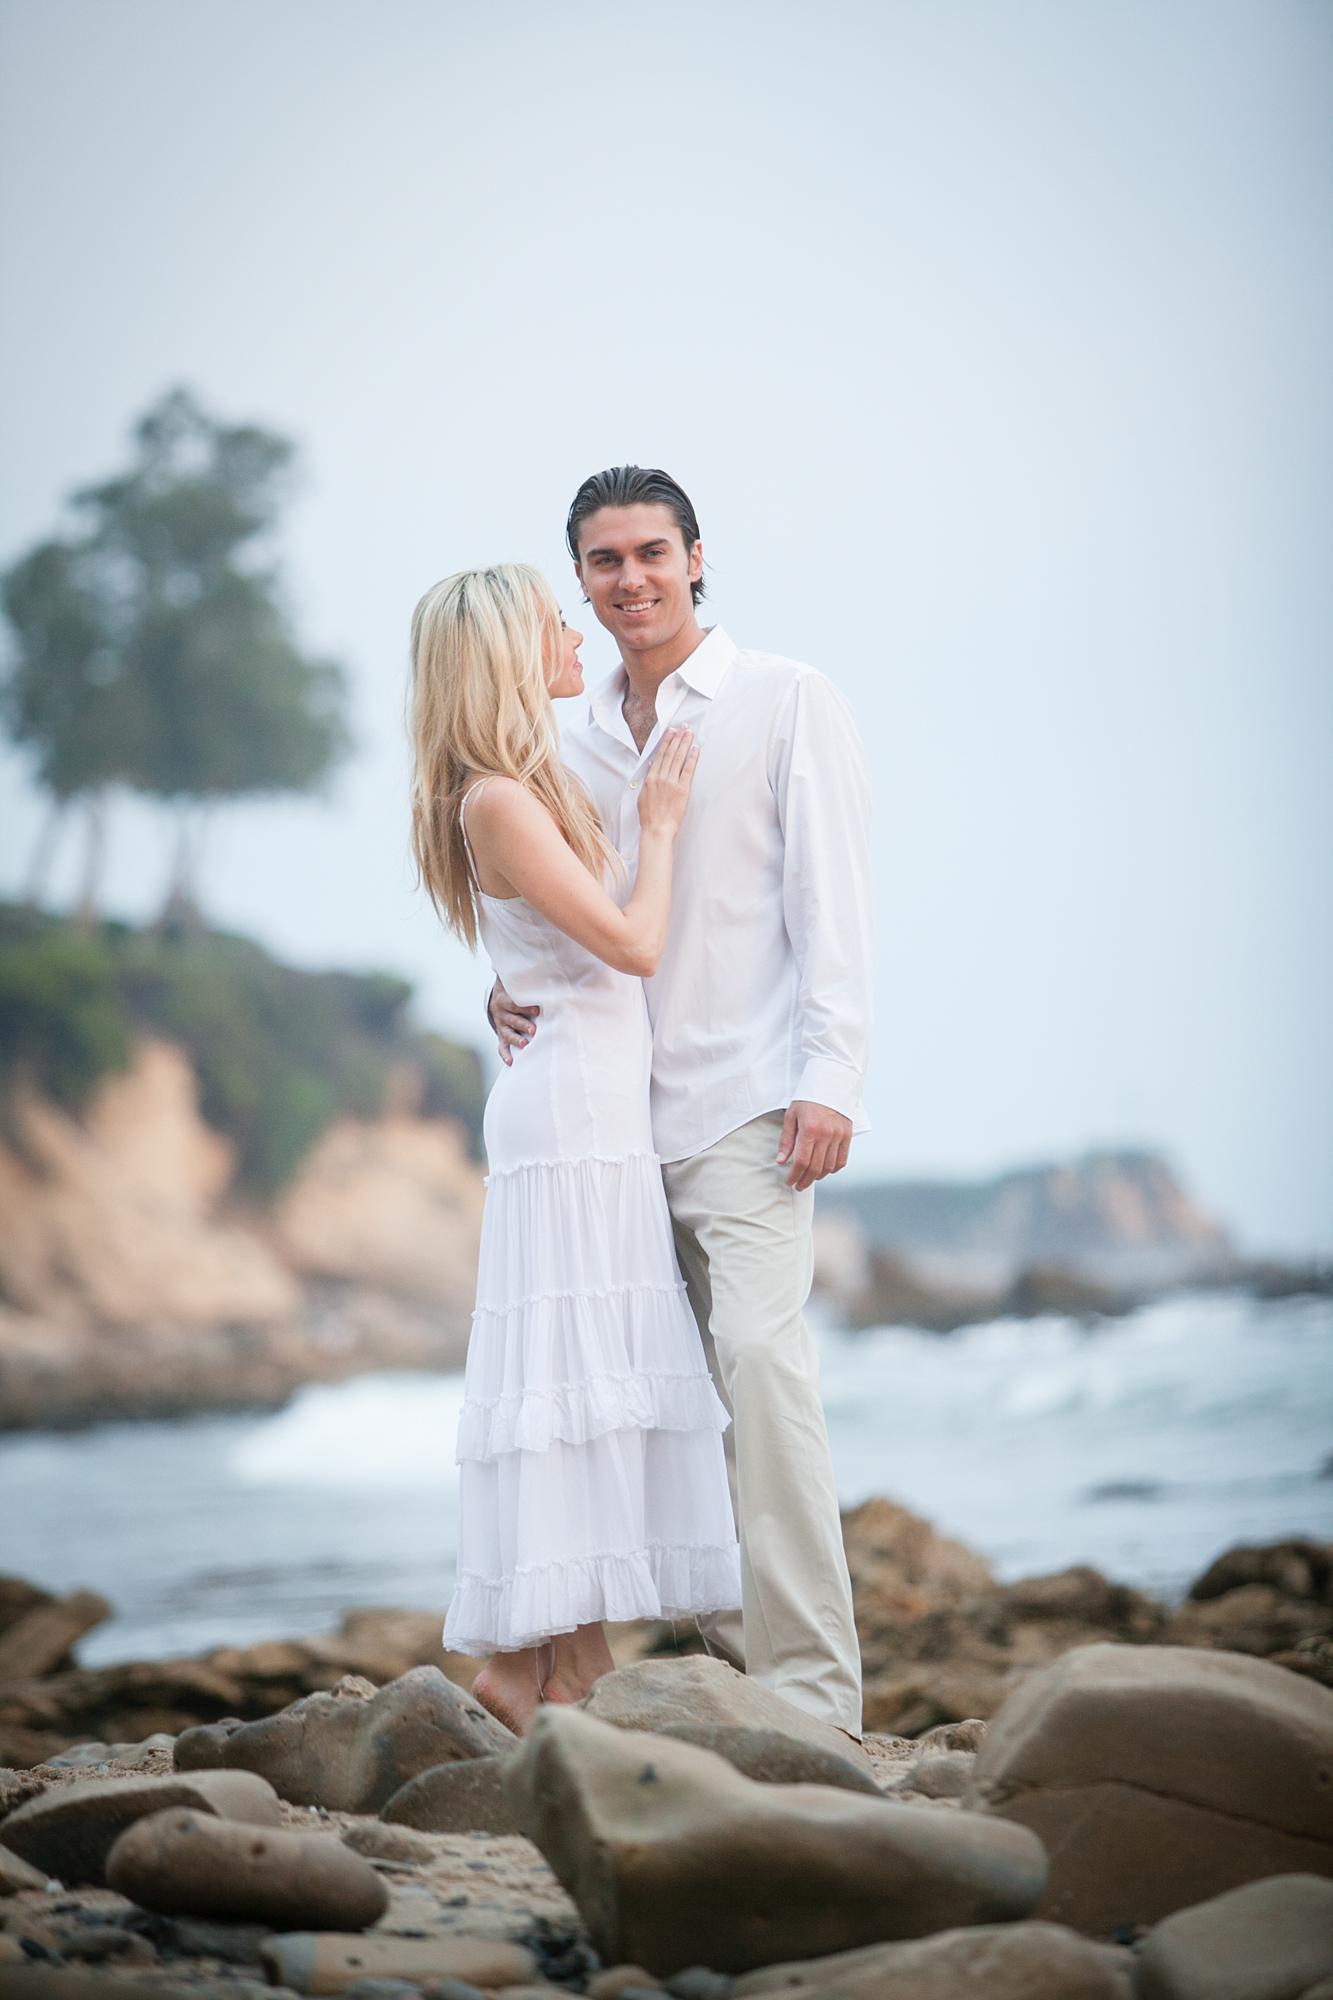 Newport Engagement | Miki & Sonja Photography | mikiandsonja.com